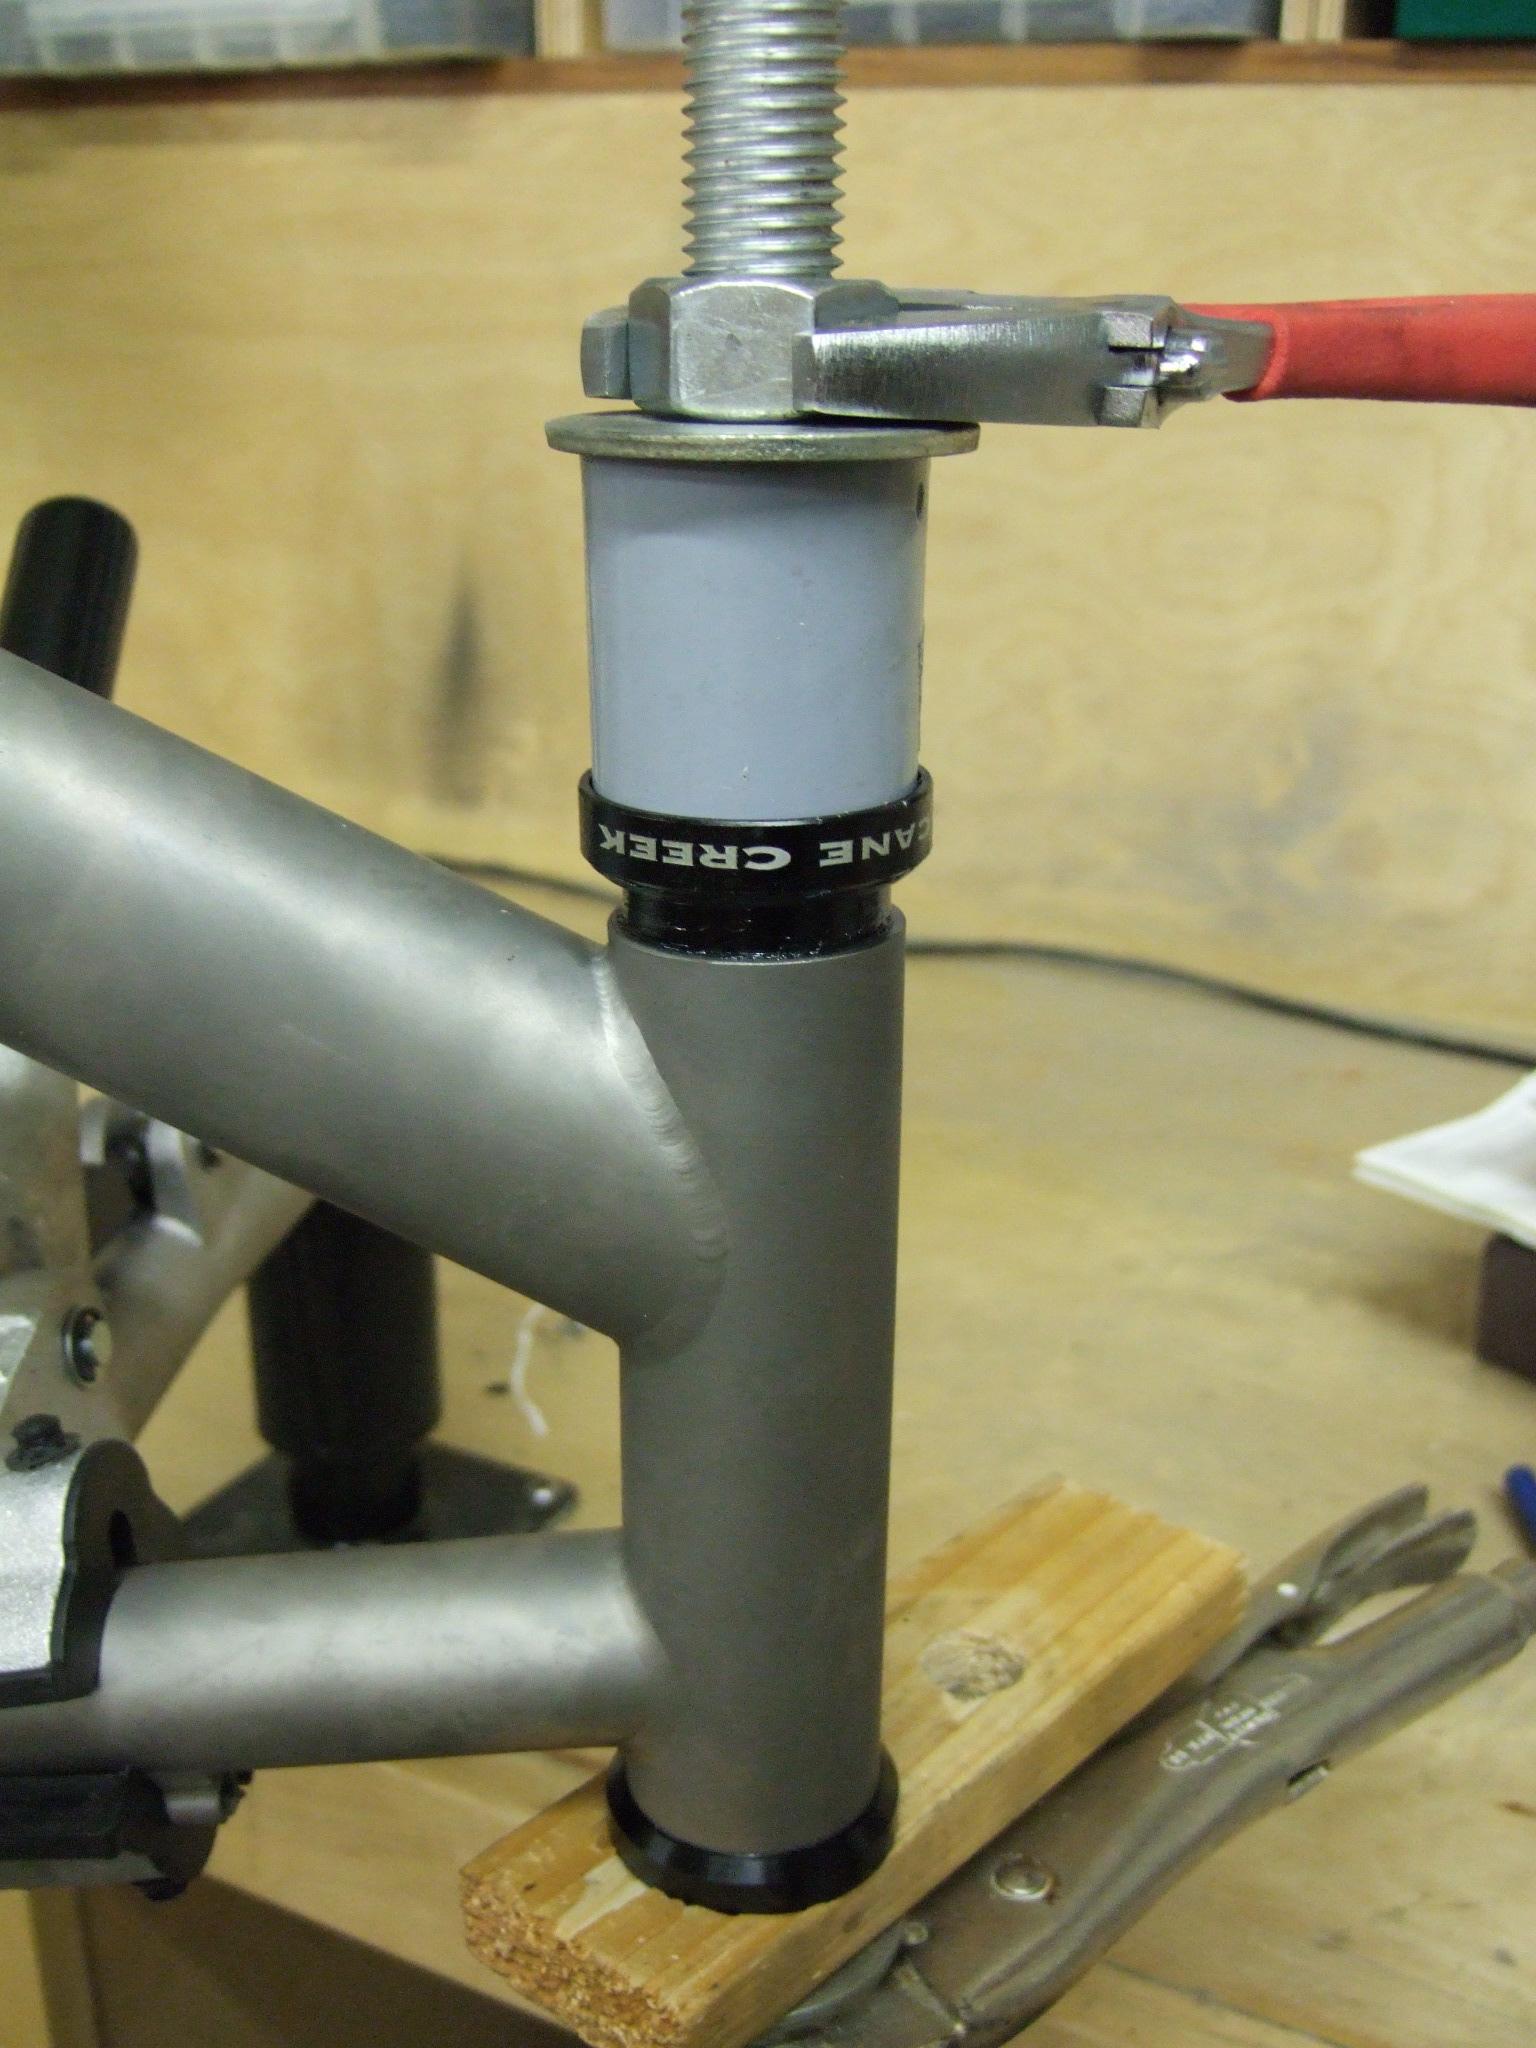 How to make a bike headset press & install a headset